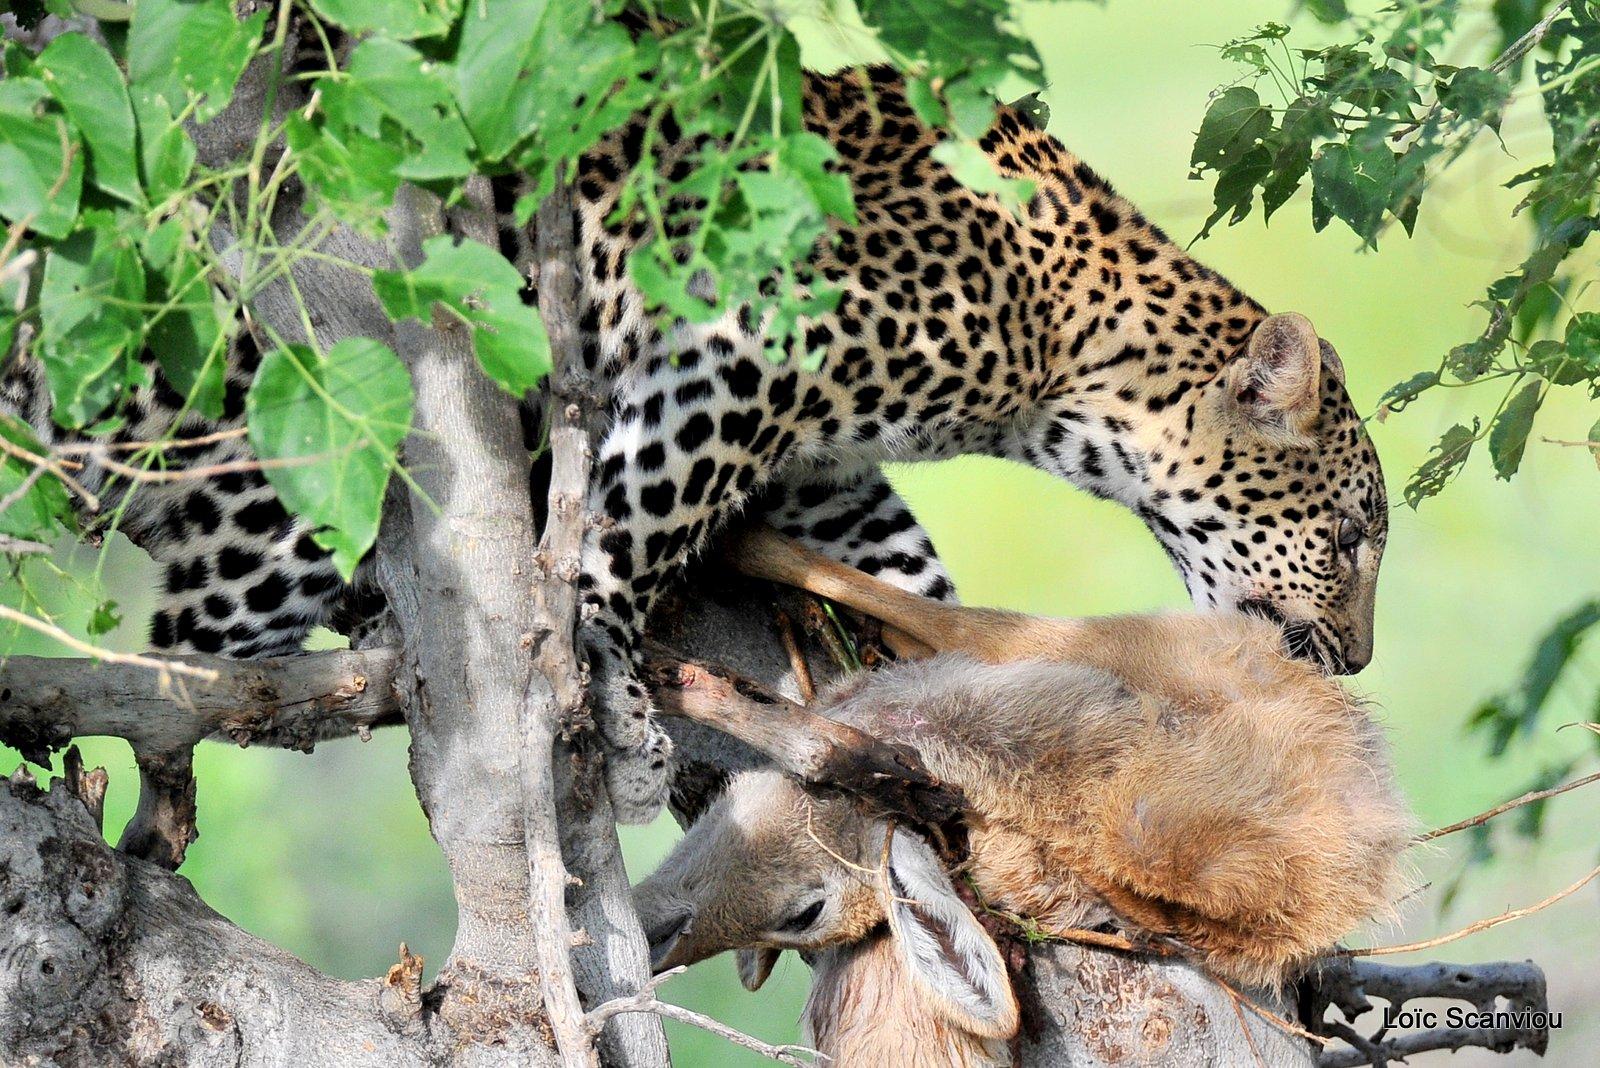 Léopard qui mange/Leopard eating (4)